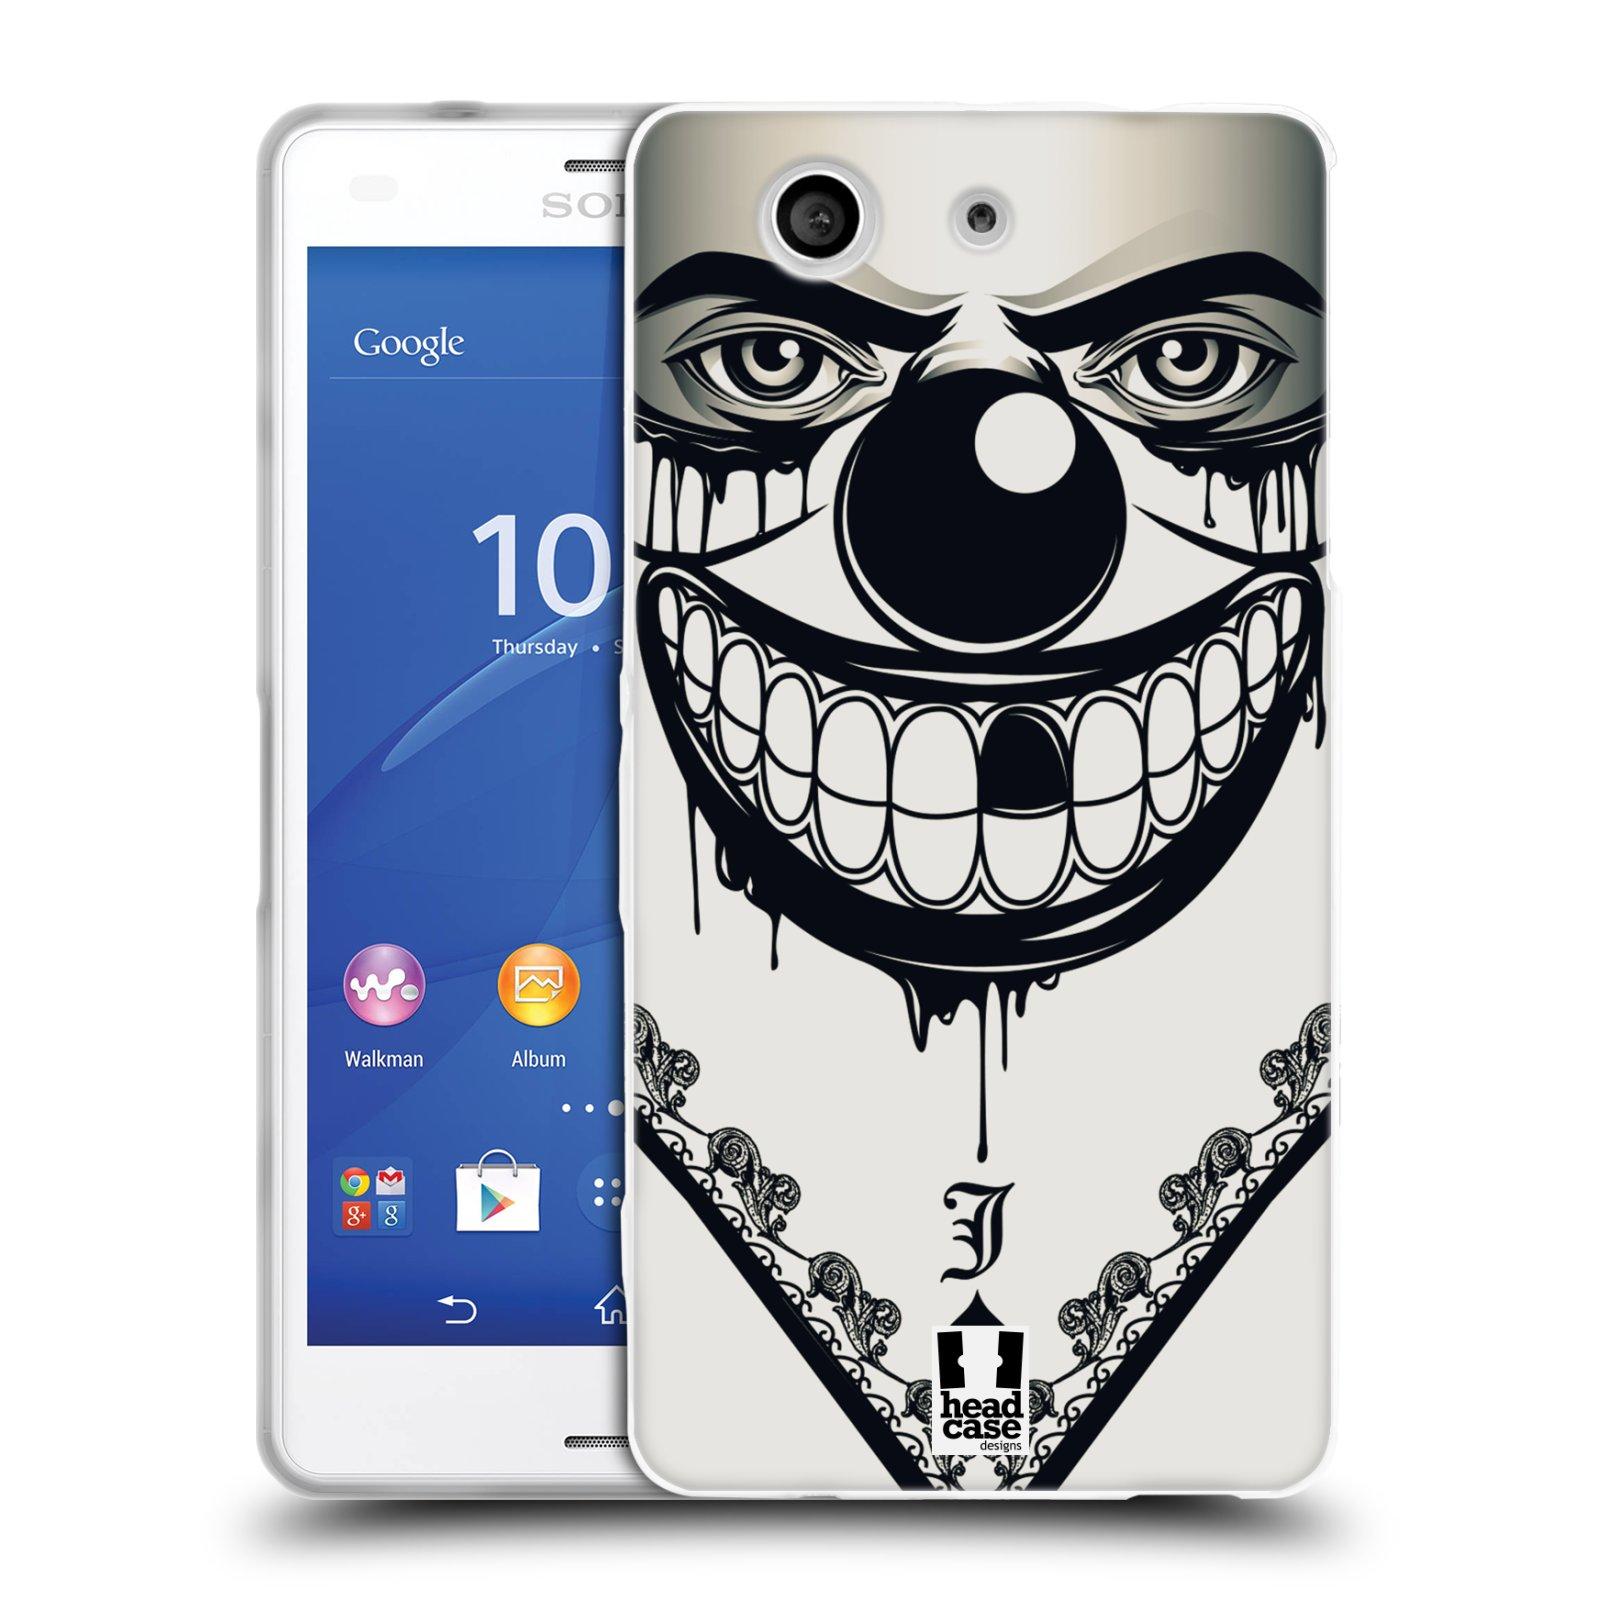 Silikonové pouzdro na mobil Sony Xperia Z3 Compact D5803 HEAD CASE ZLEJ KLAUN